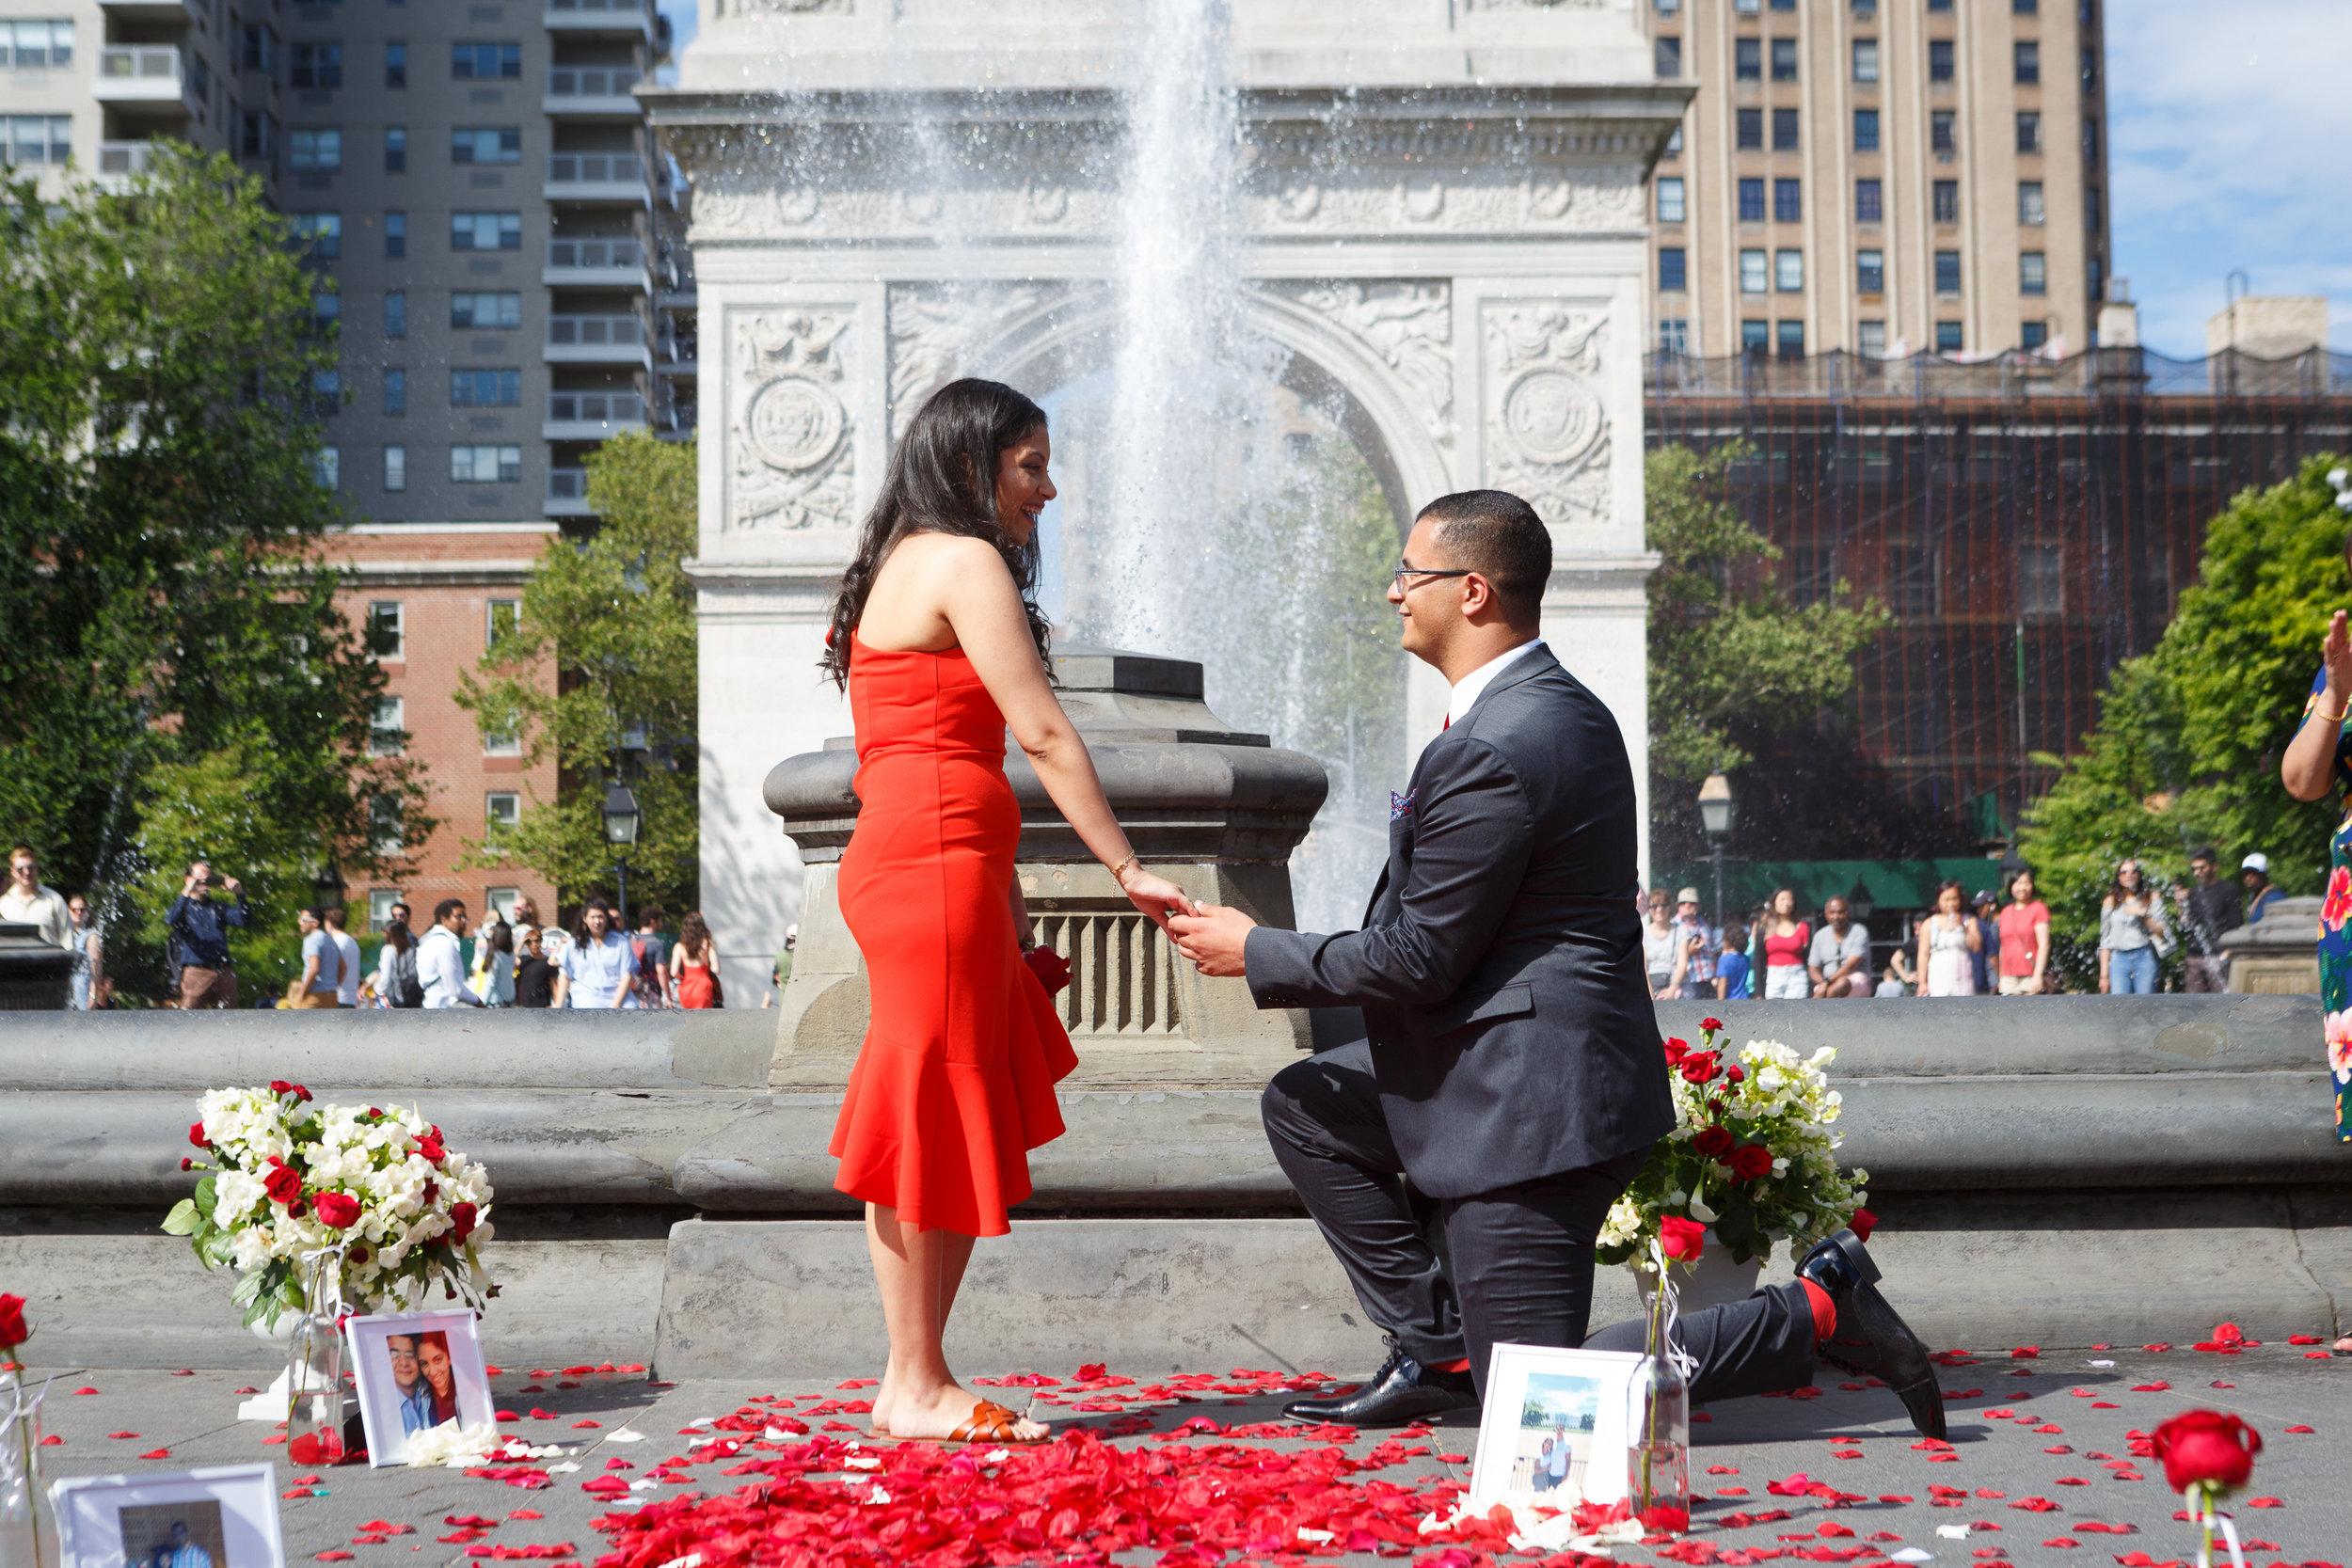 Kiro Rebecca Washington Square Park Marriage Proposal _ Jonathan Heisler _ 6152019 _021.jpg